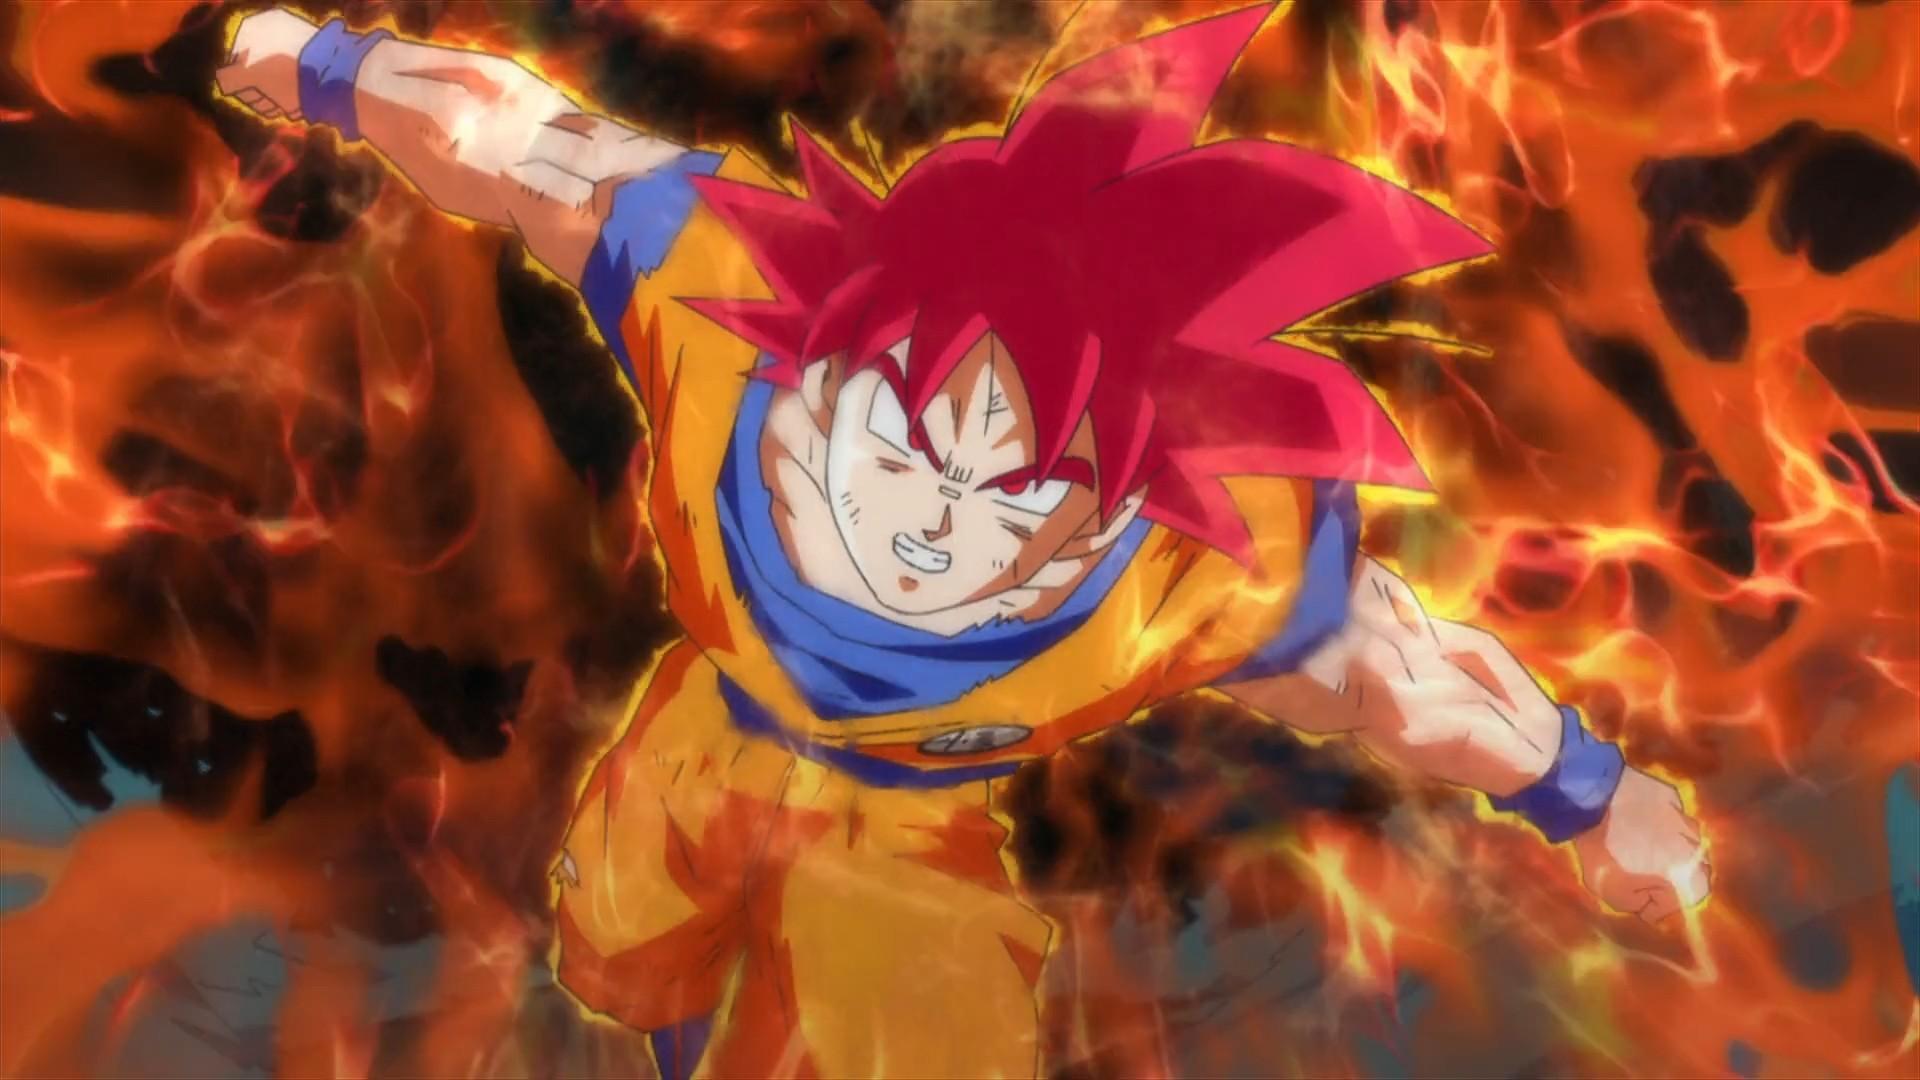 Son Goku Super Saiyan God – Dragon Ball Z Battle of Gods Wallpaper 10 of 49